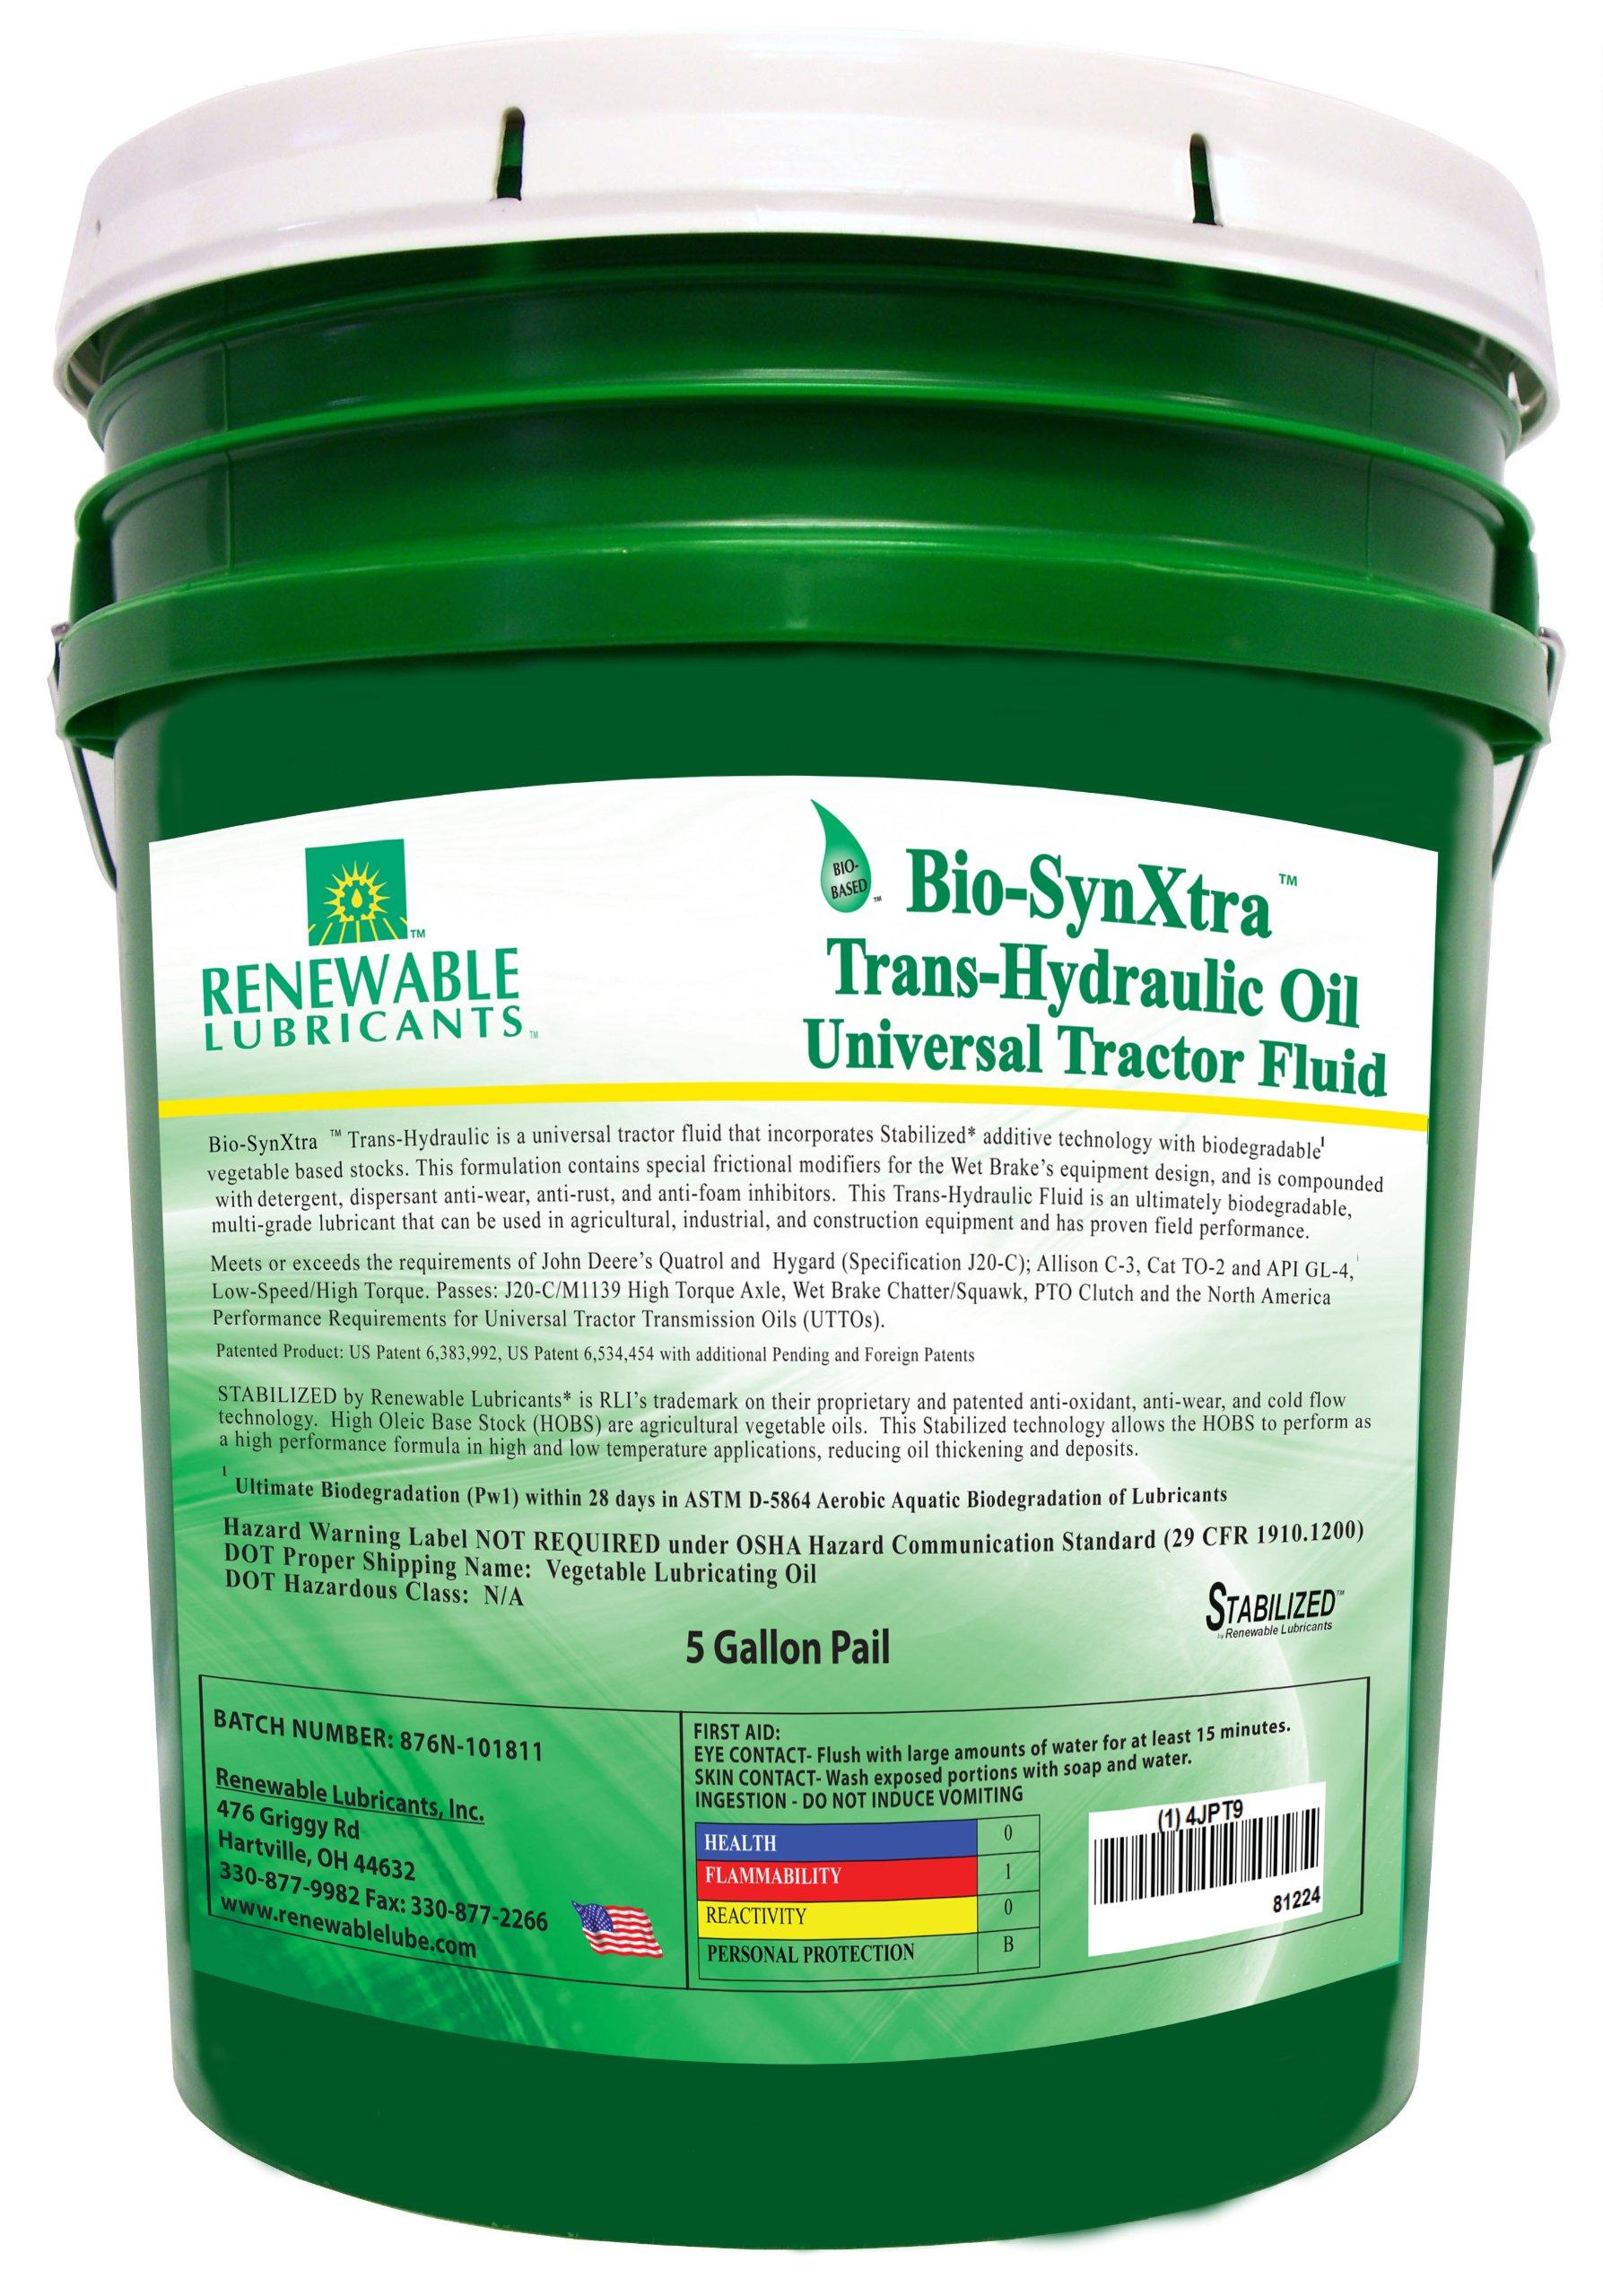 Renewable Lubricants Bio-SynXtra Trans-Hydraulic Universal Tractor Fluid, 5 Gallon Pail